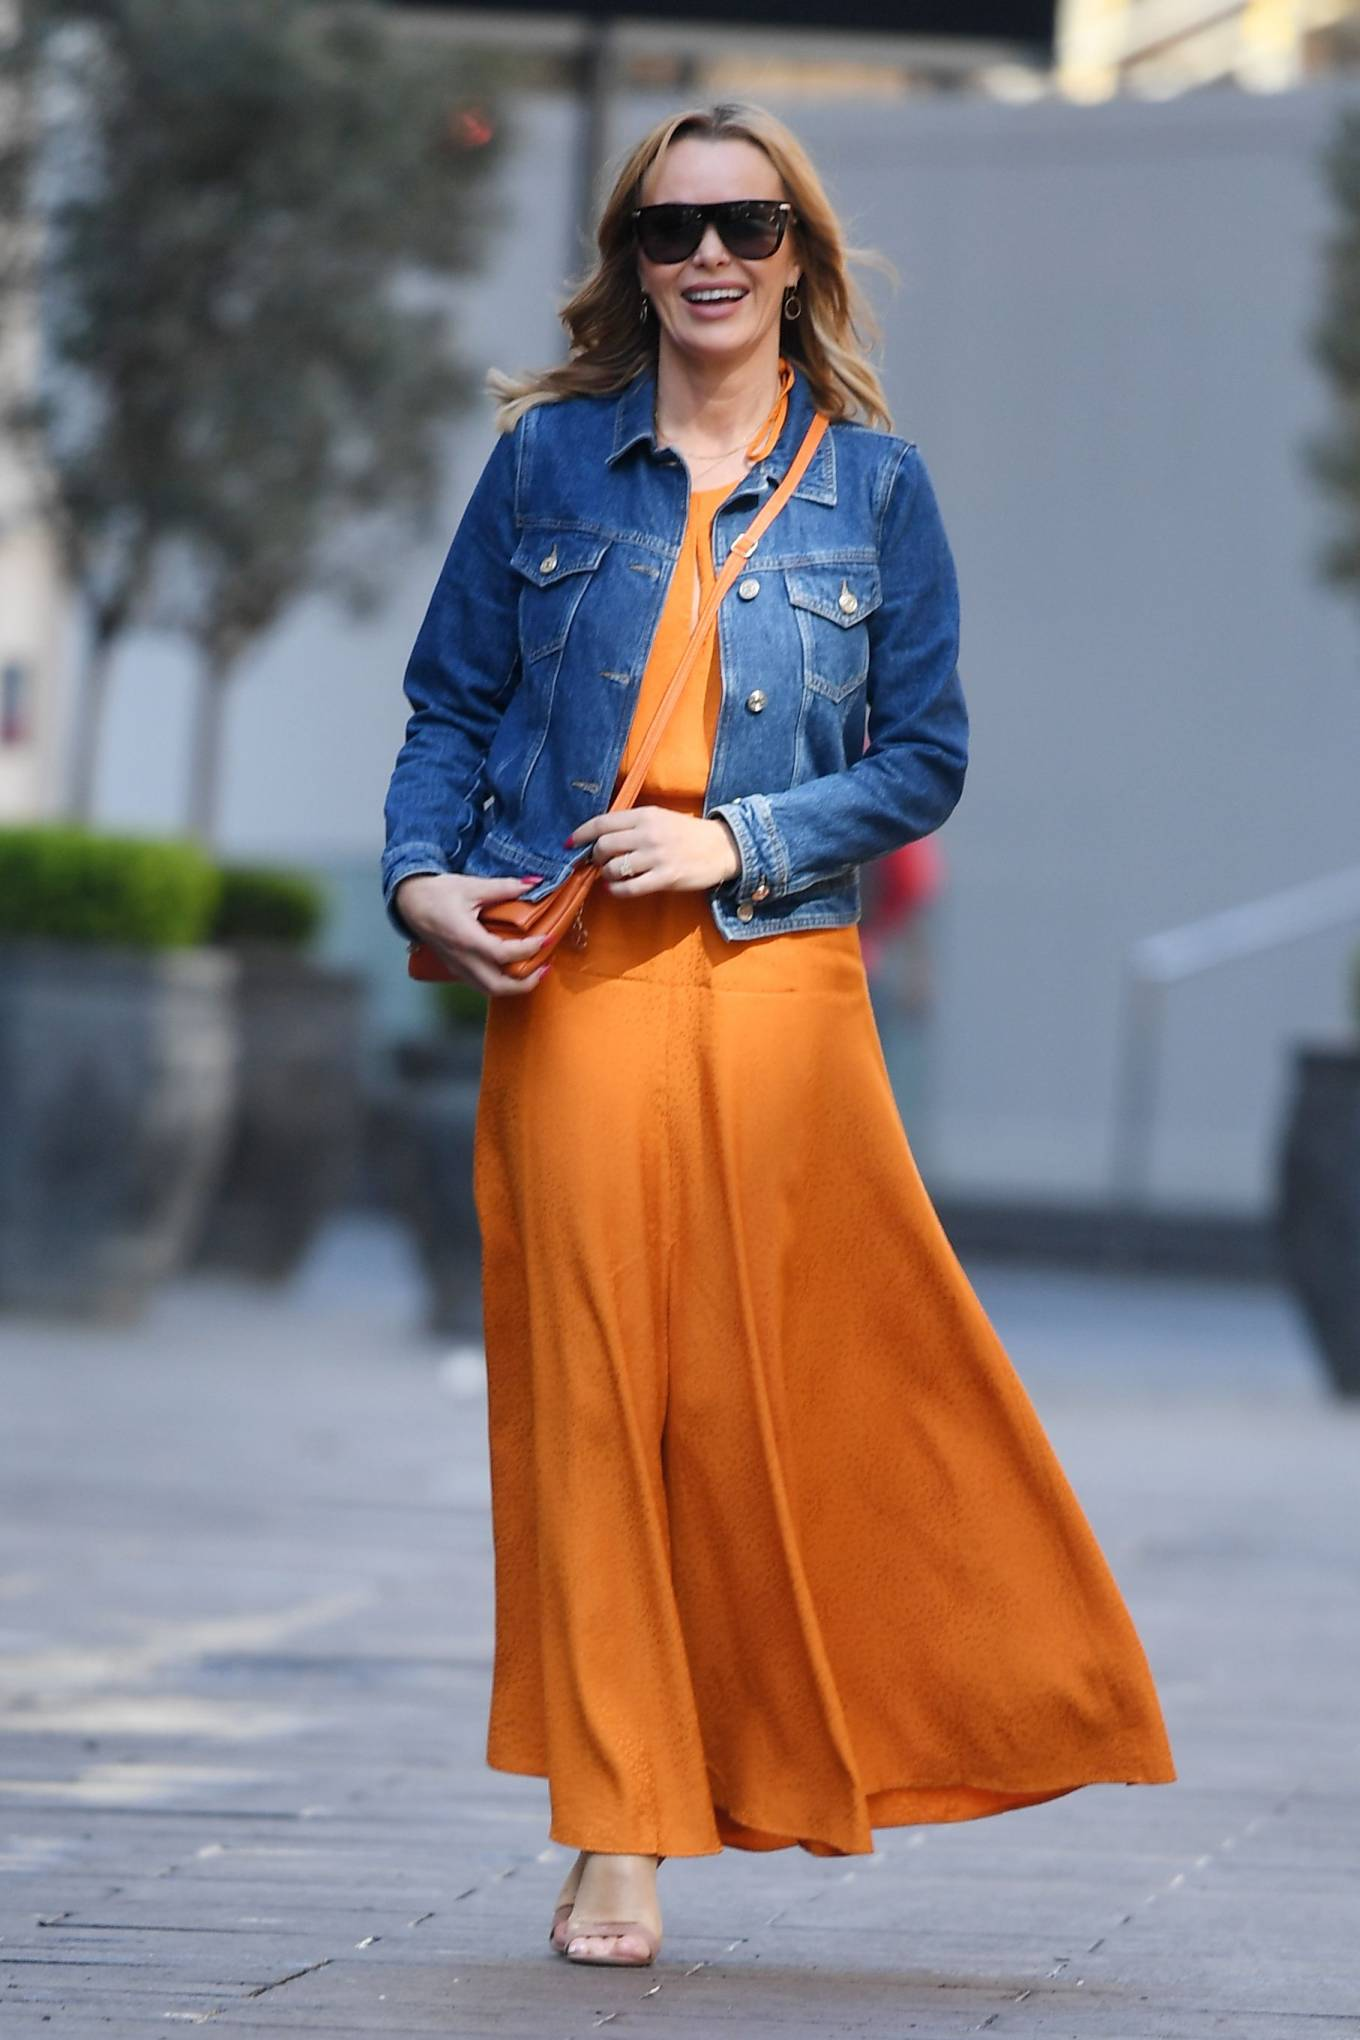 Amanda Holden 2021 : Amanda Holden – In dress leaving the Global Radio Studios in London-07